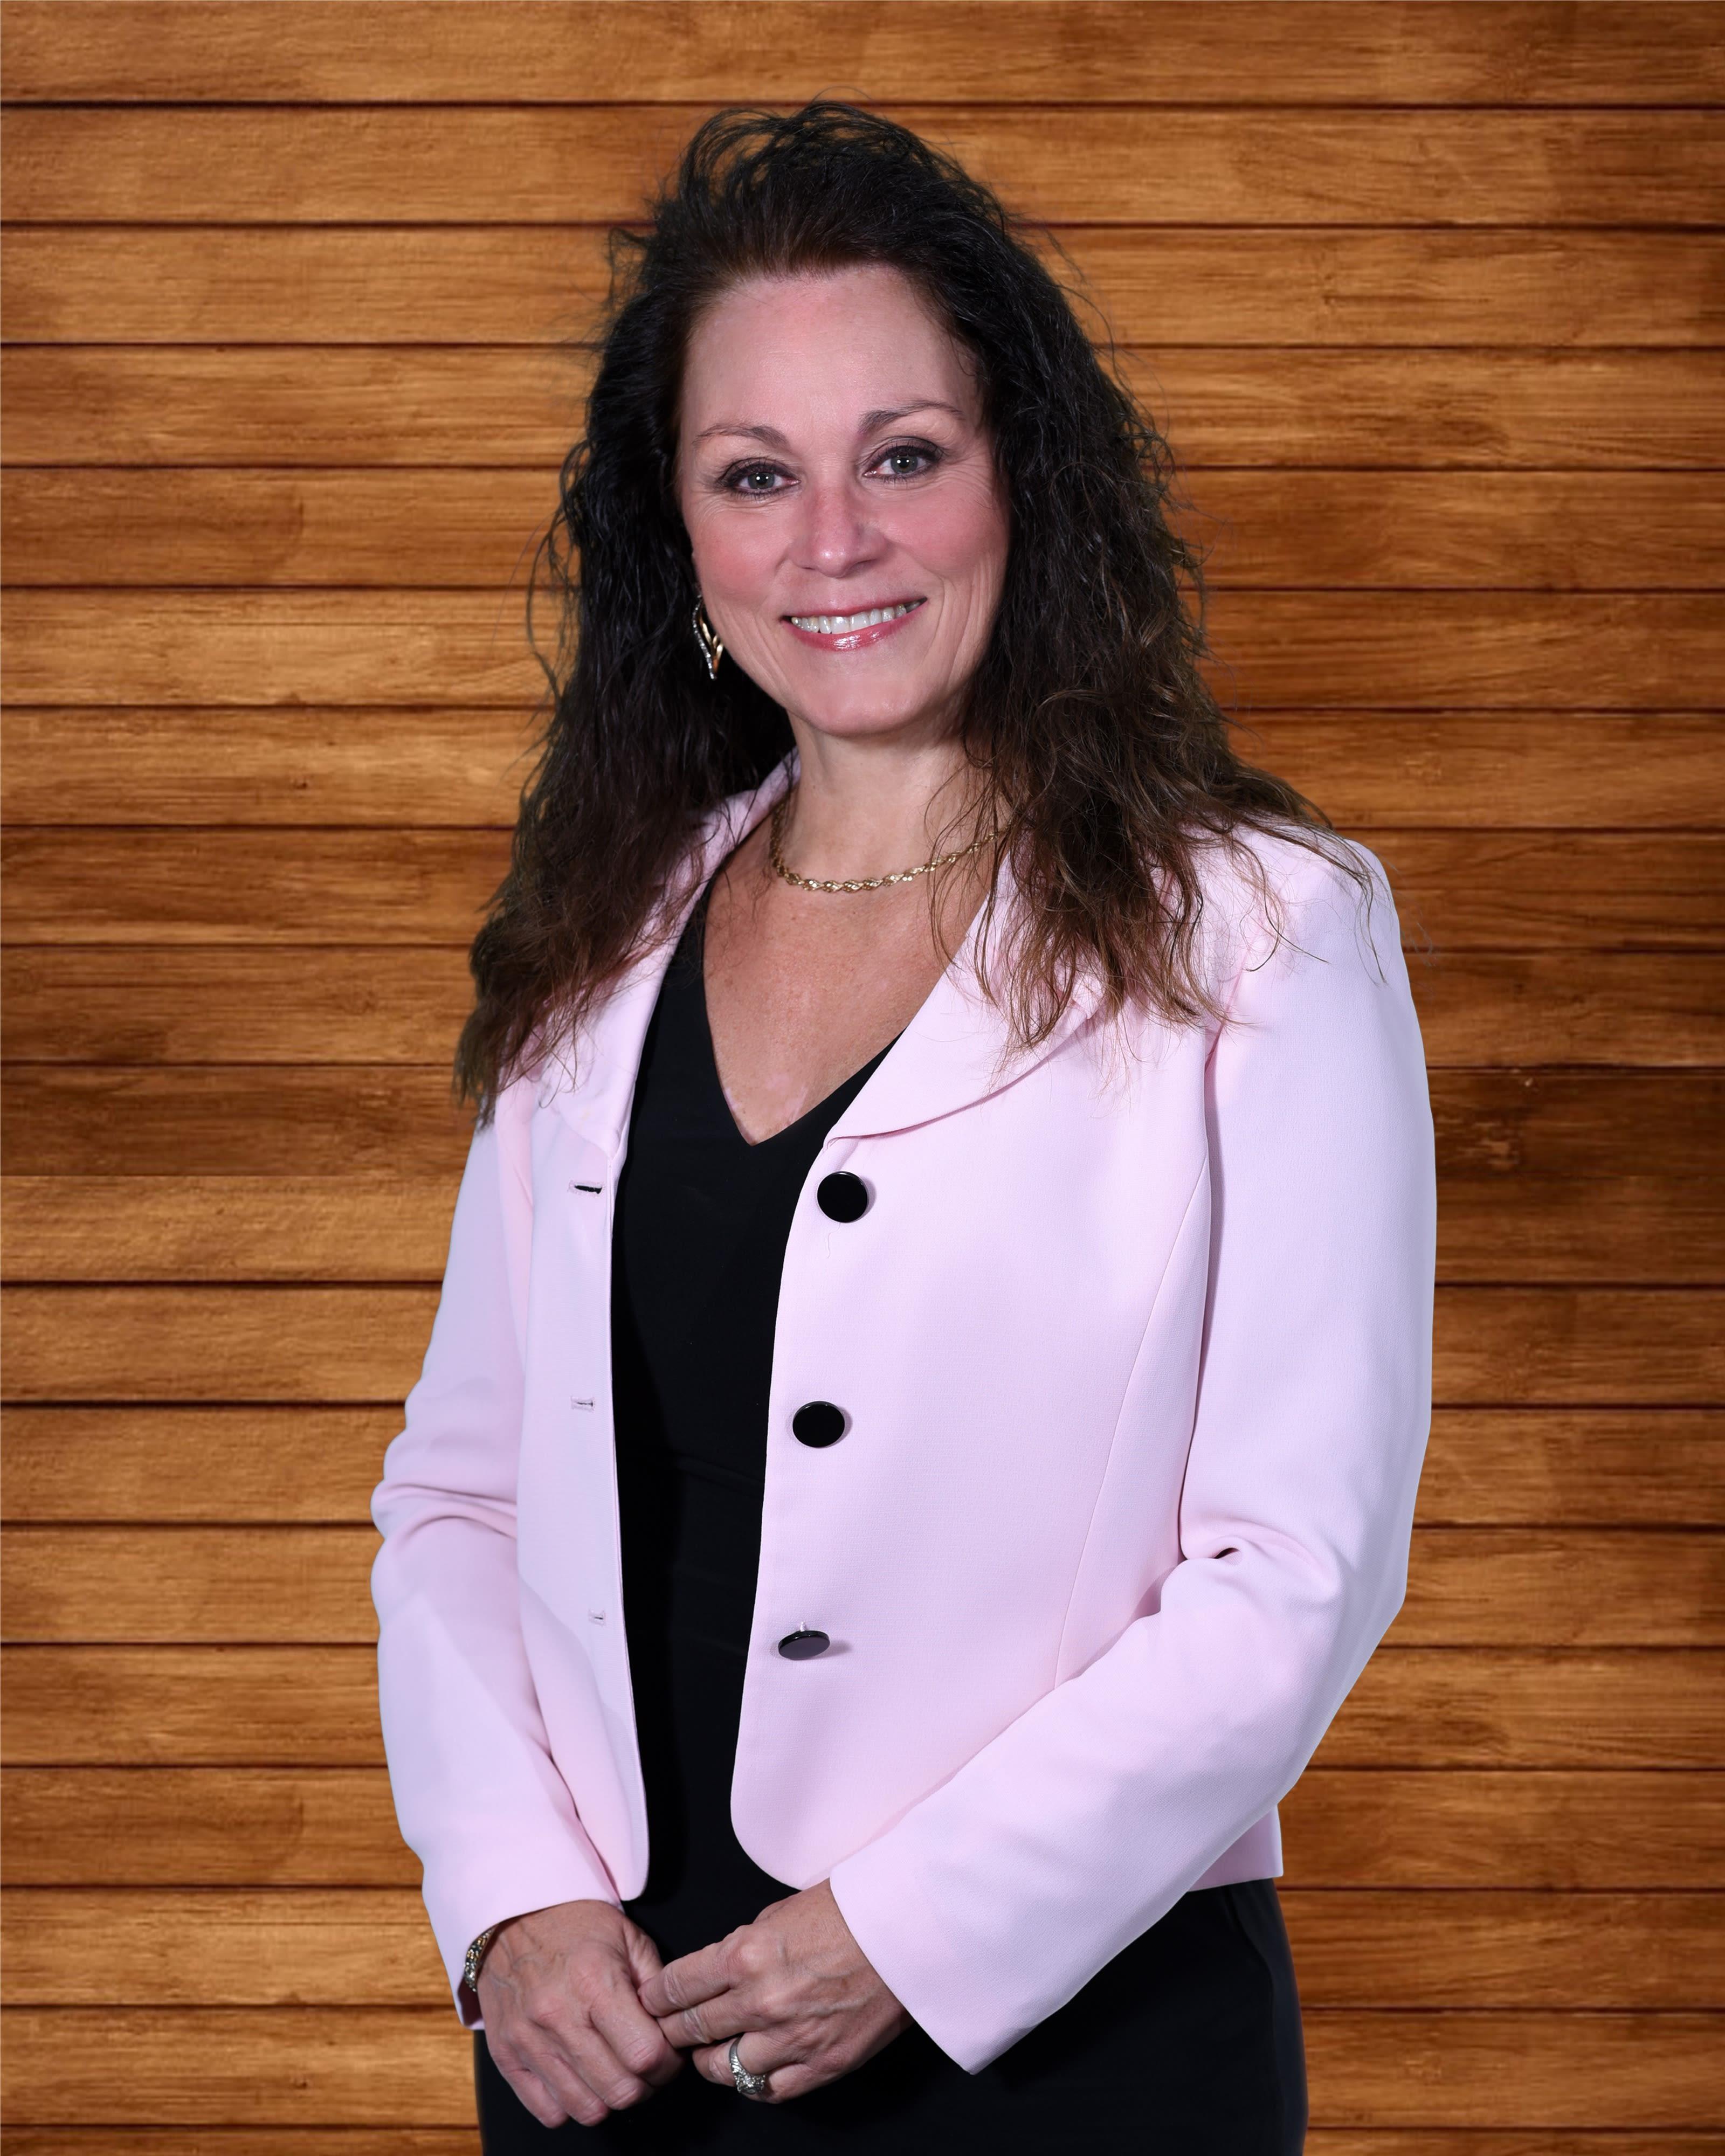 Kristen Fogle, Chief People Officer at Elegance Living, LLC